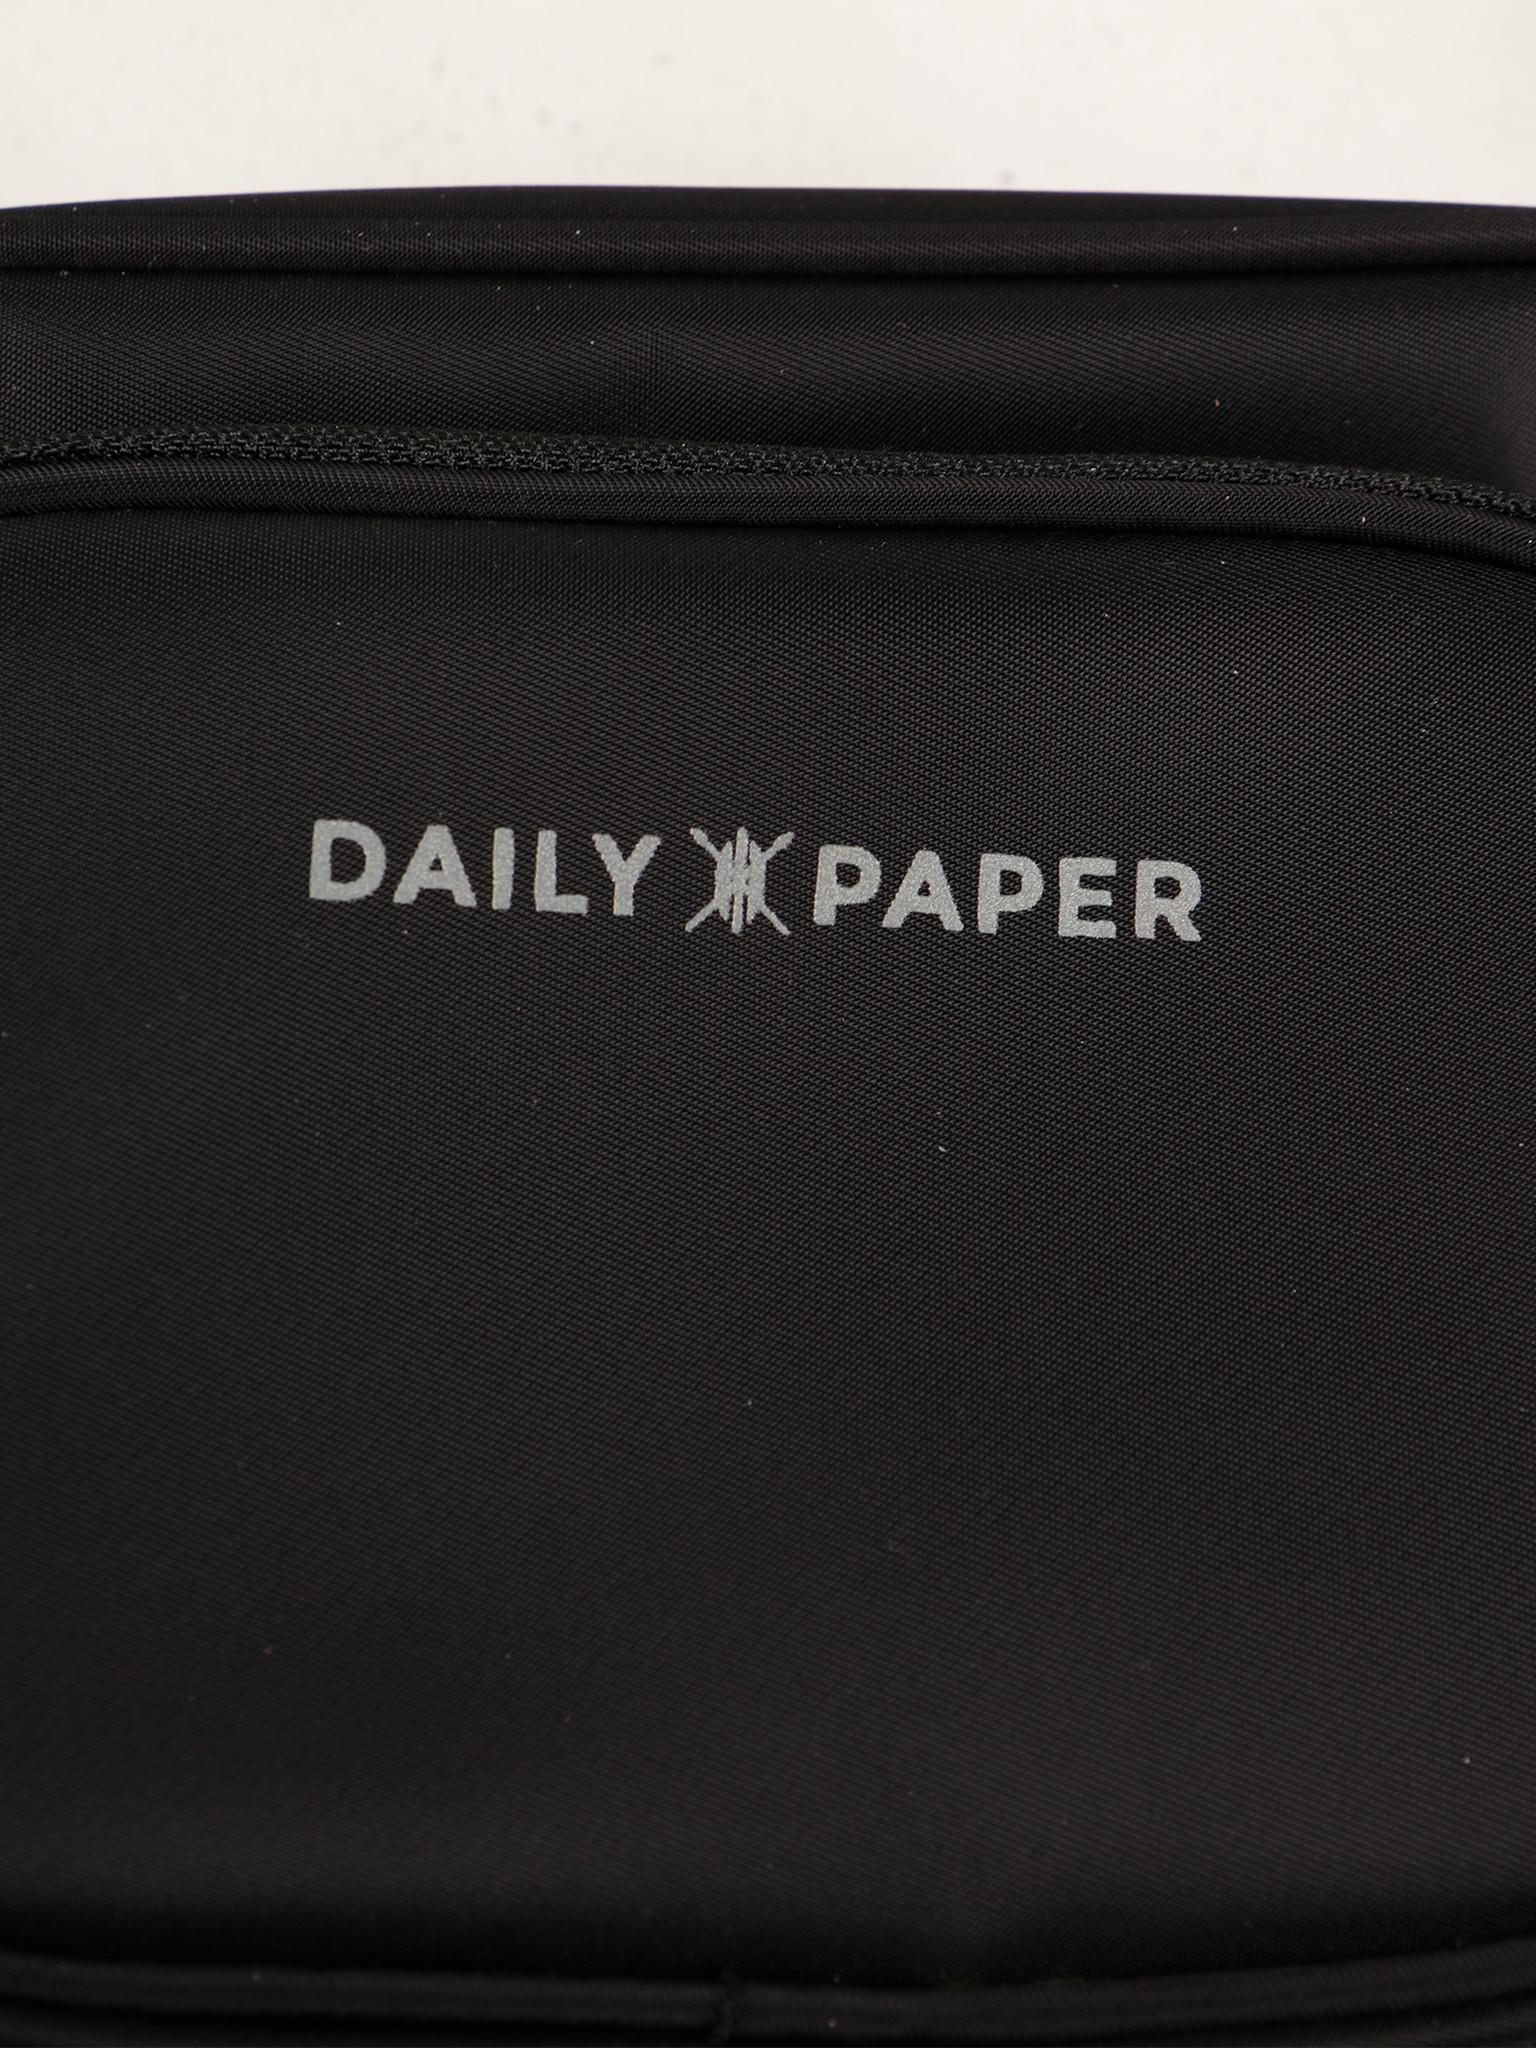 Daily Paper Daily Paper Hamea Black 20S1AC18-01